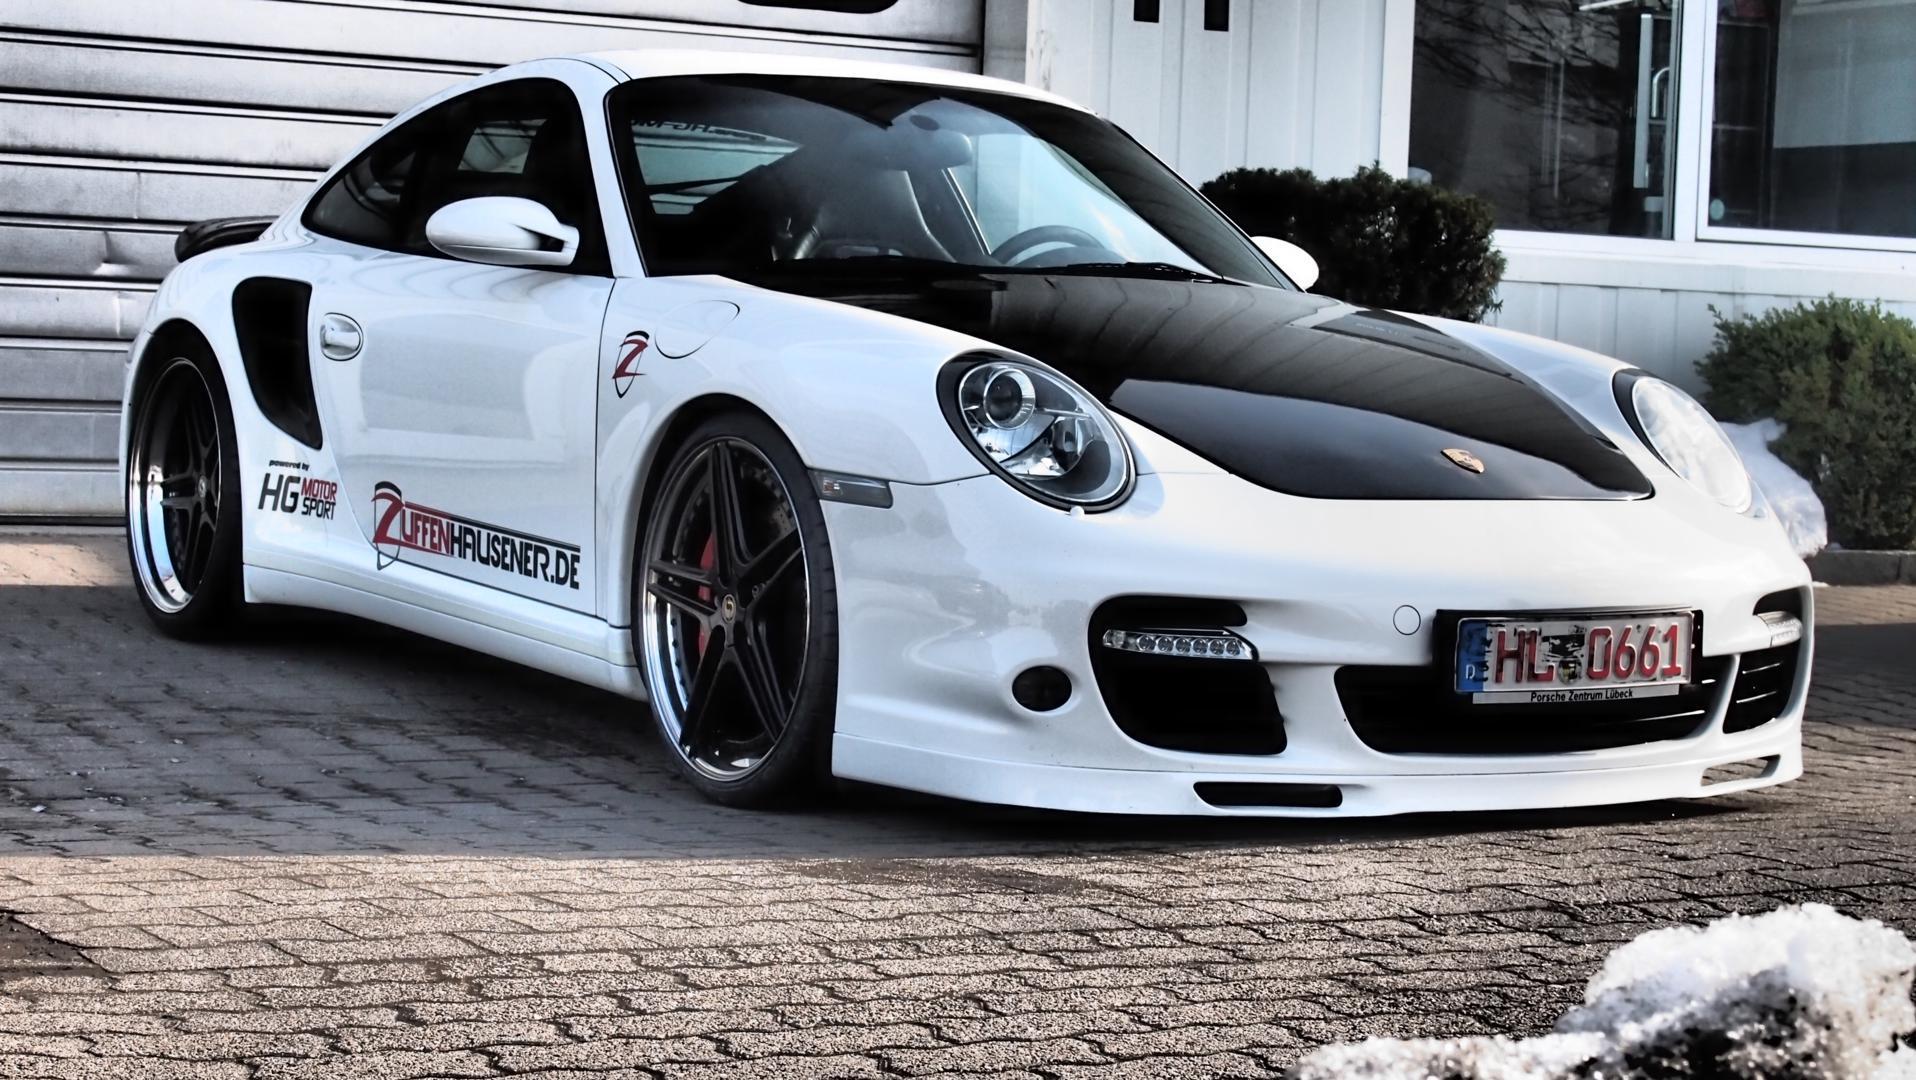 porsche 911 turbo fs line hg motorsport gmbh schmidt felgen. Black Bedroom Furniture Sets. Home Design Ideas